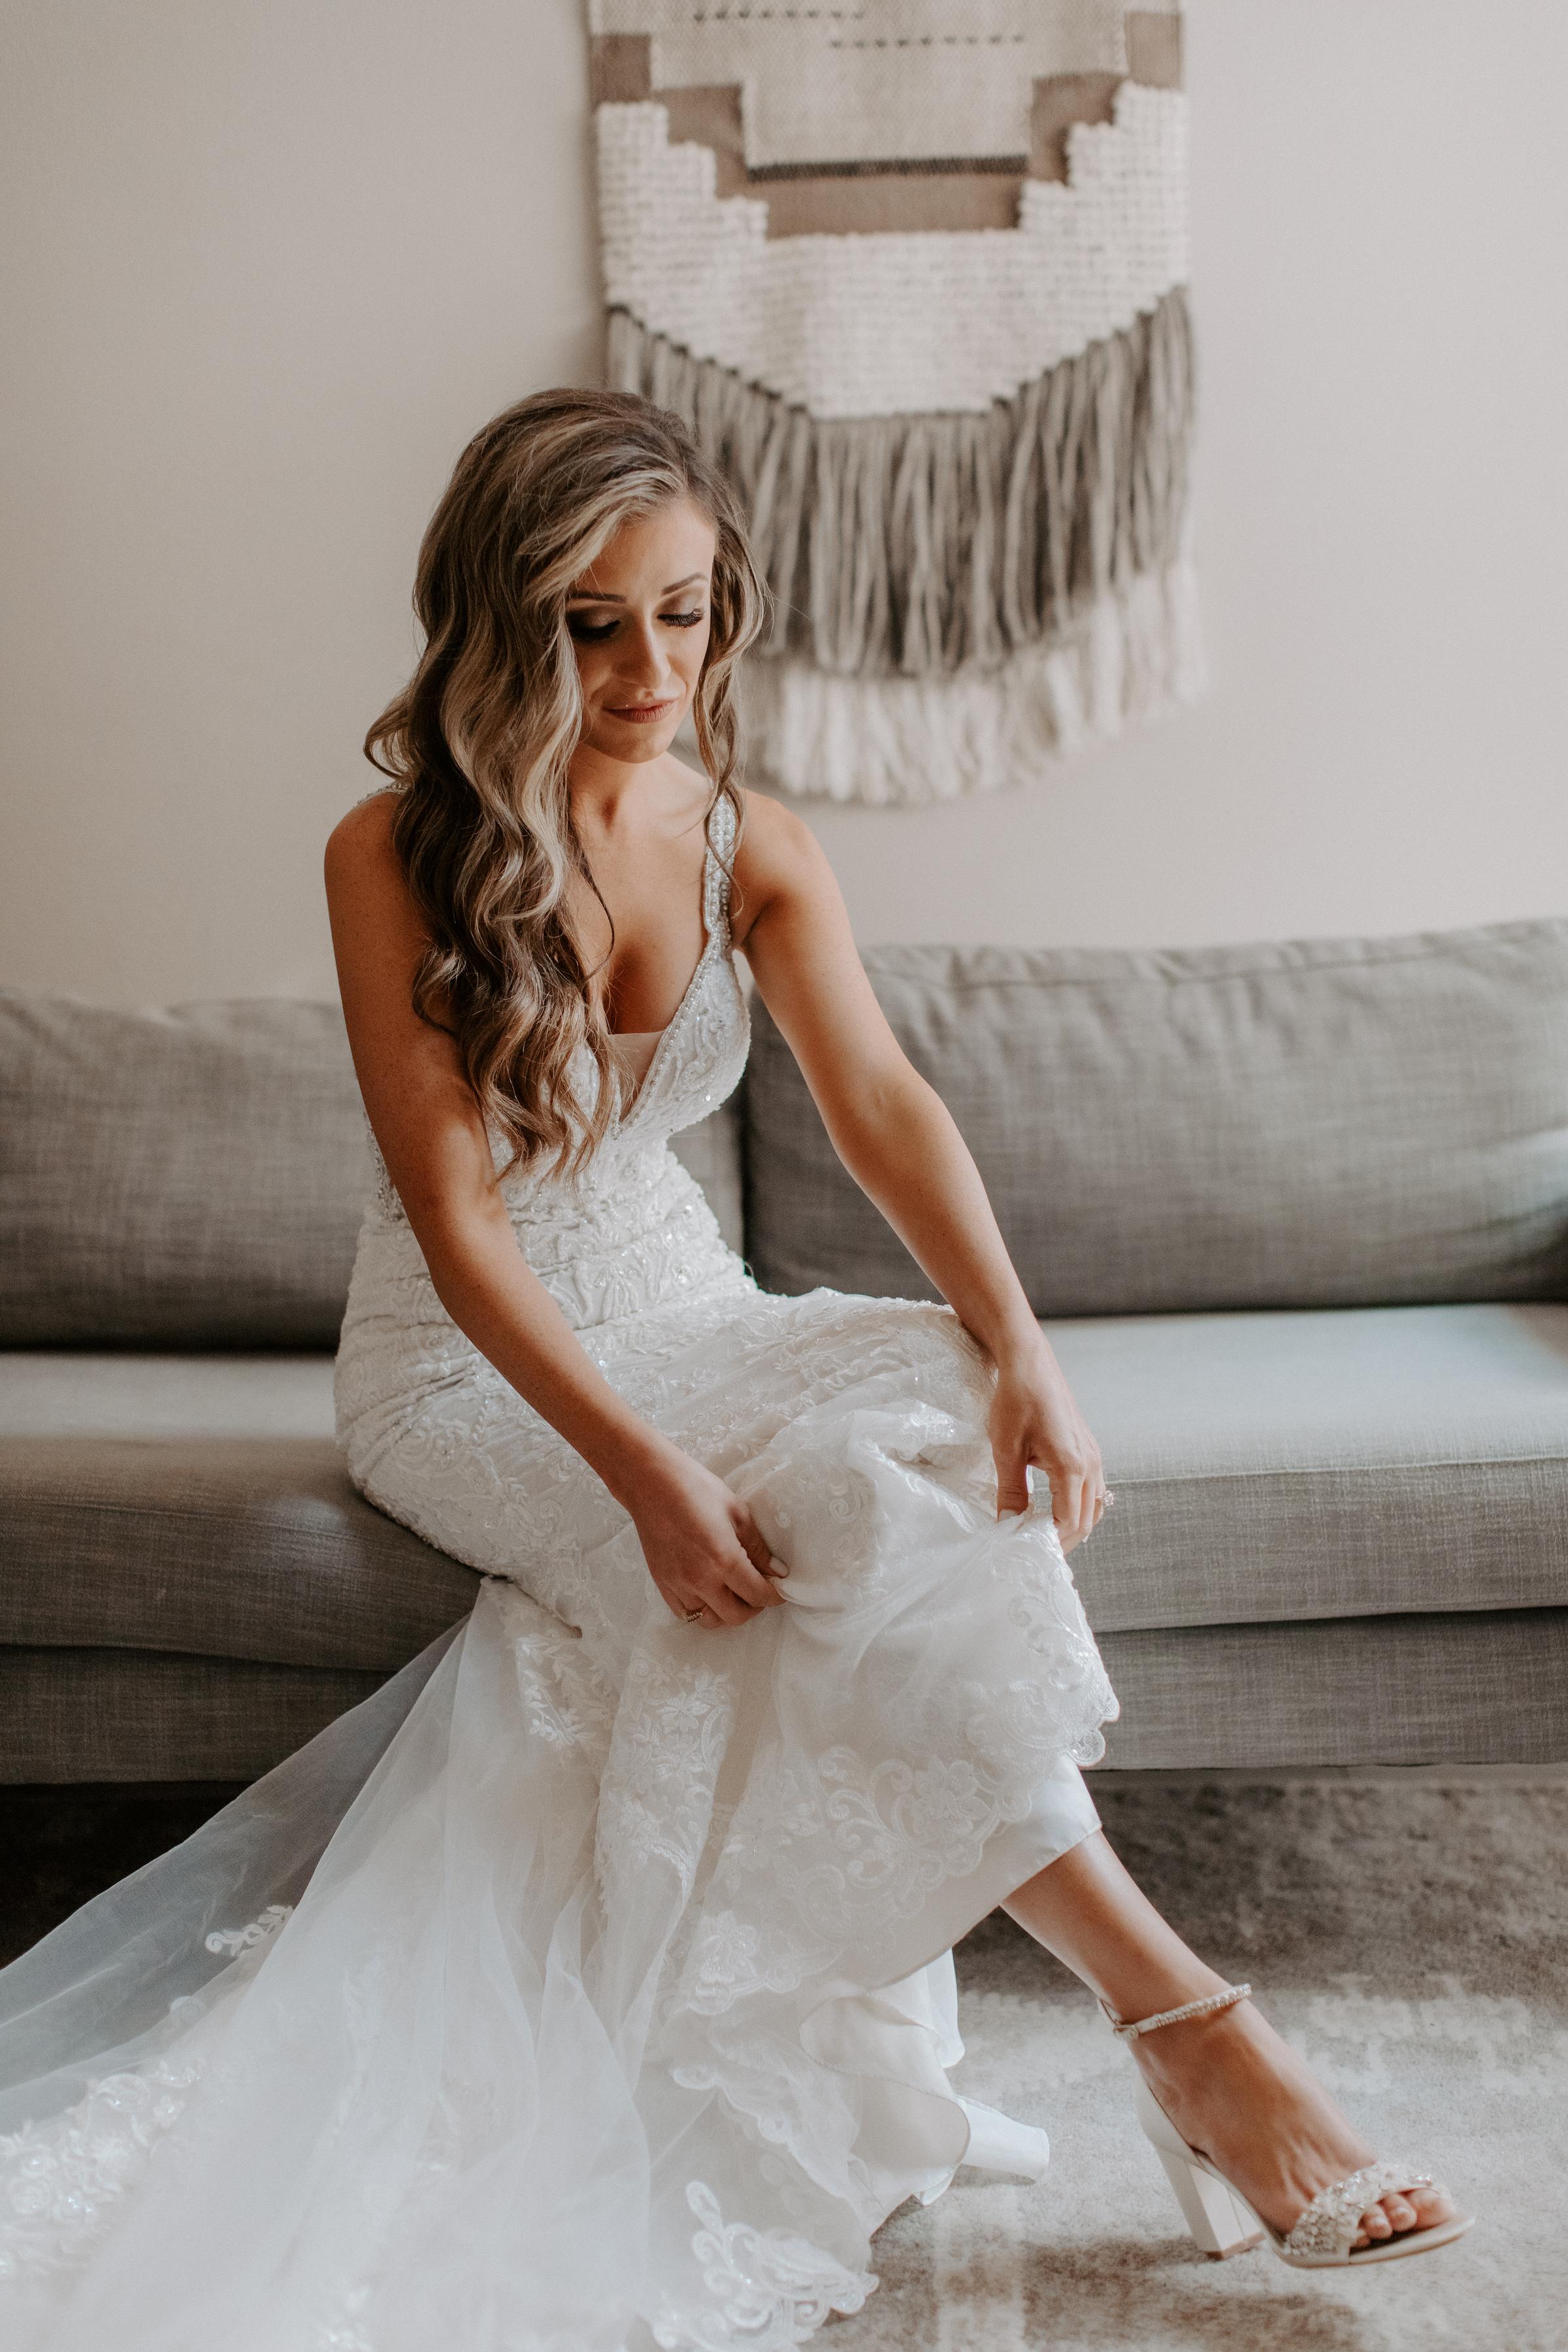 Neutral Toned Timeless Lake Tahoe Wedding Kay Kroshus22